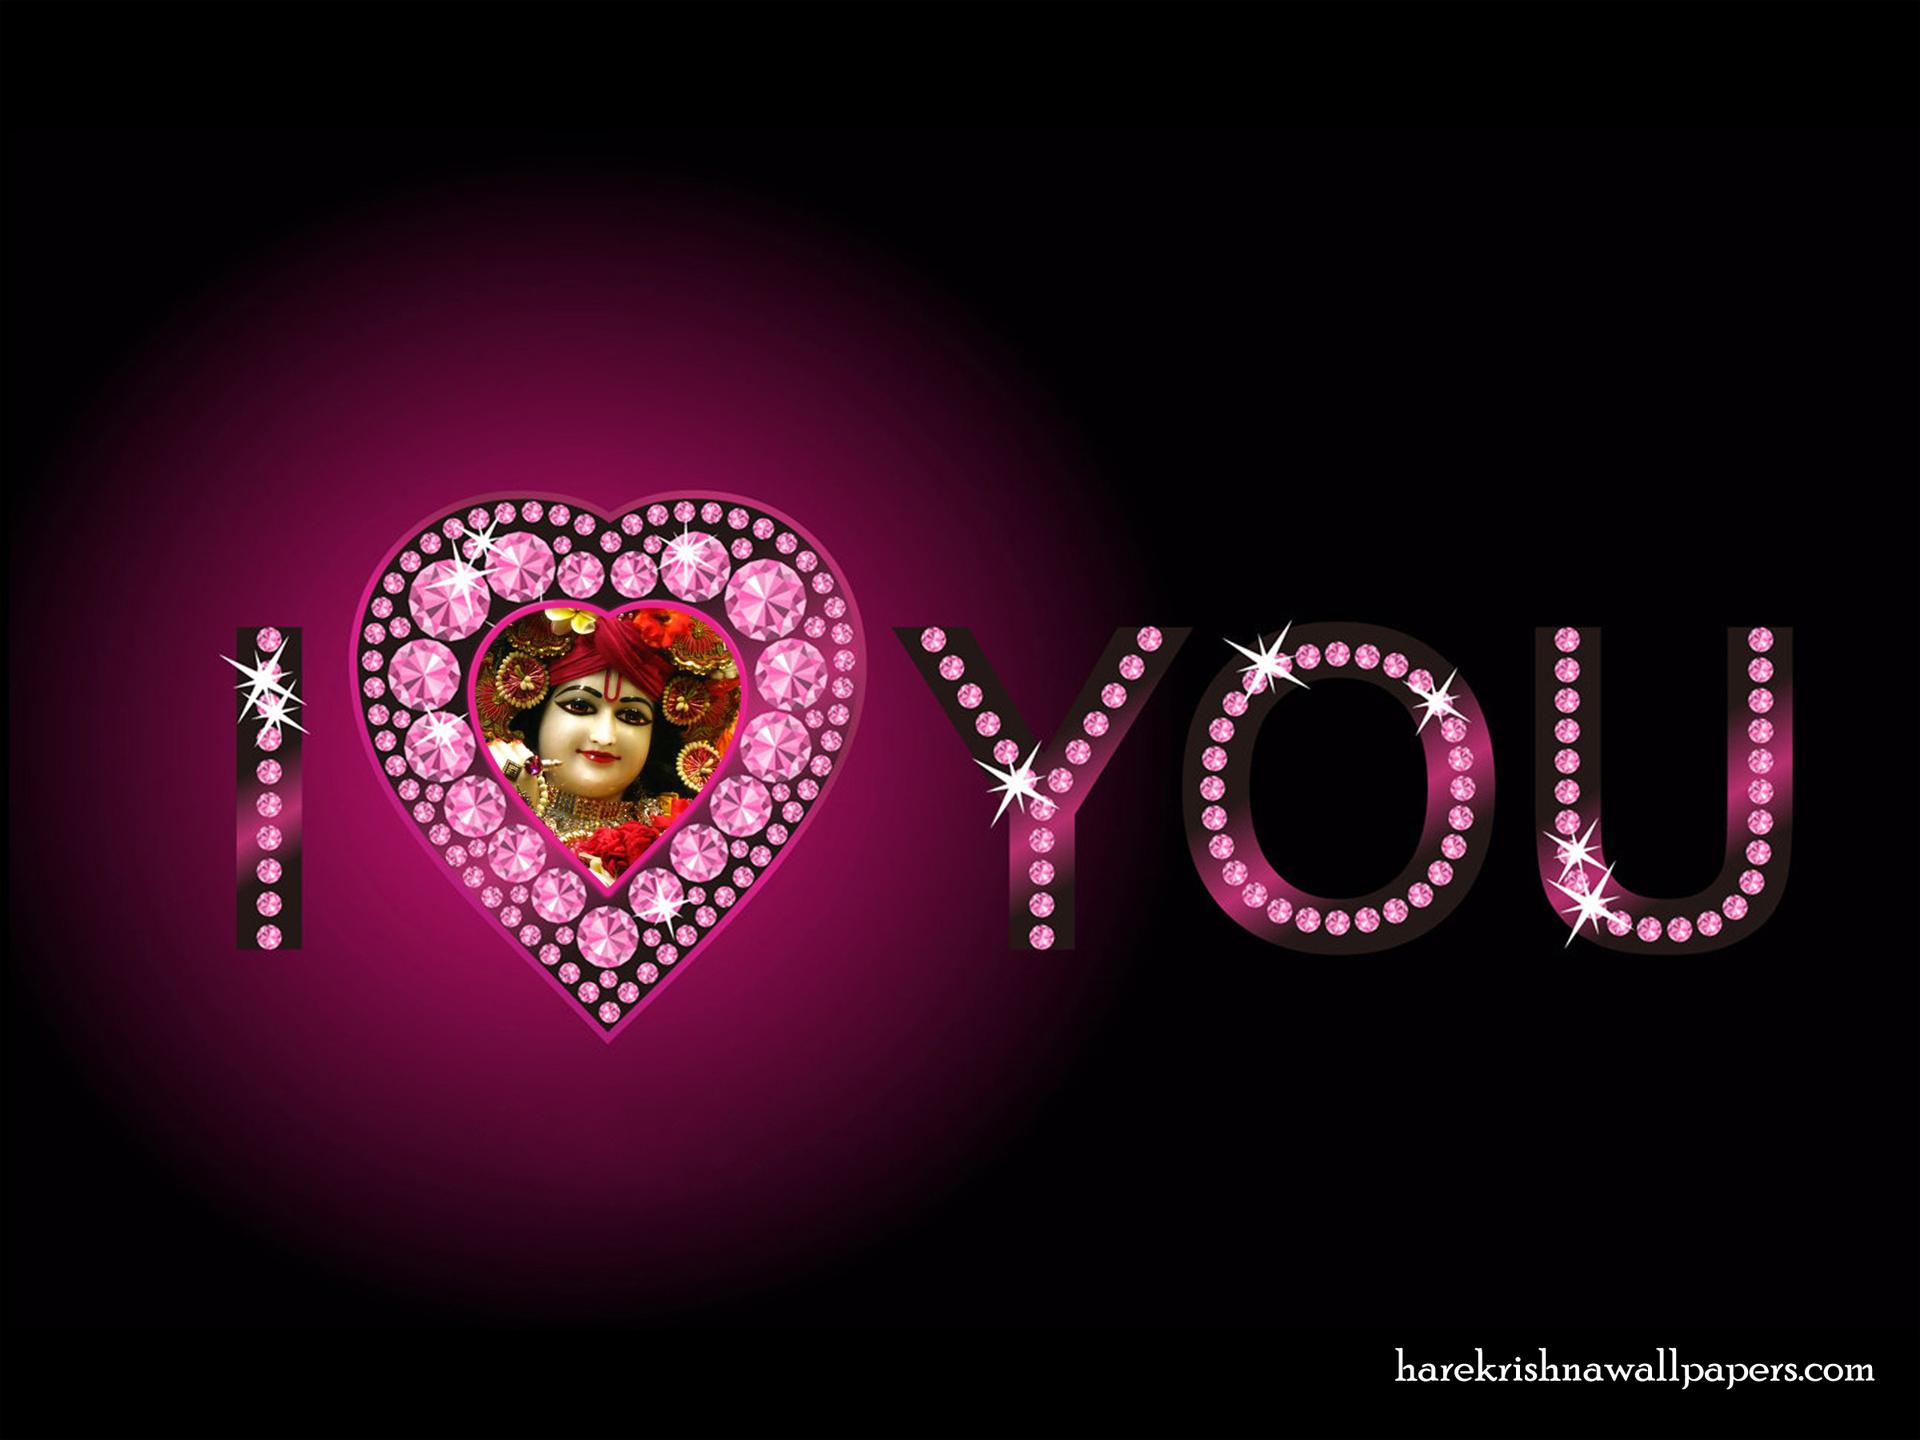 I Love You Rasabihari Wallpaper (004) Size 1920x1440 Download